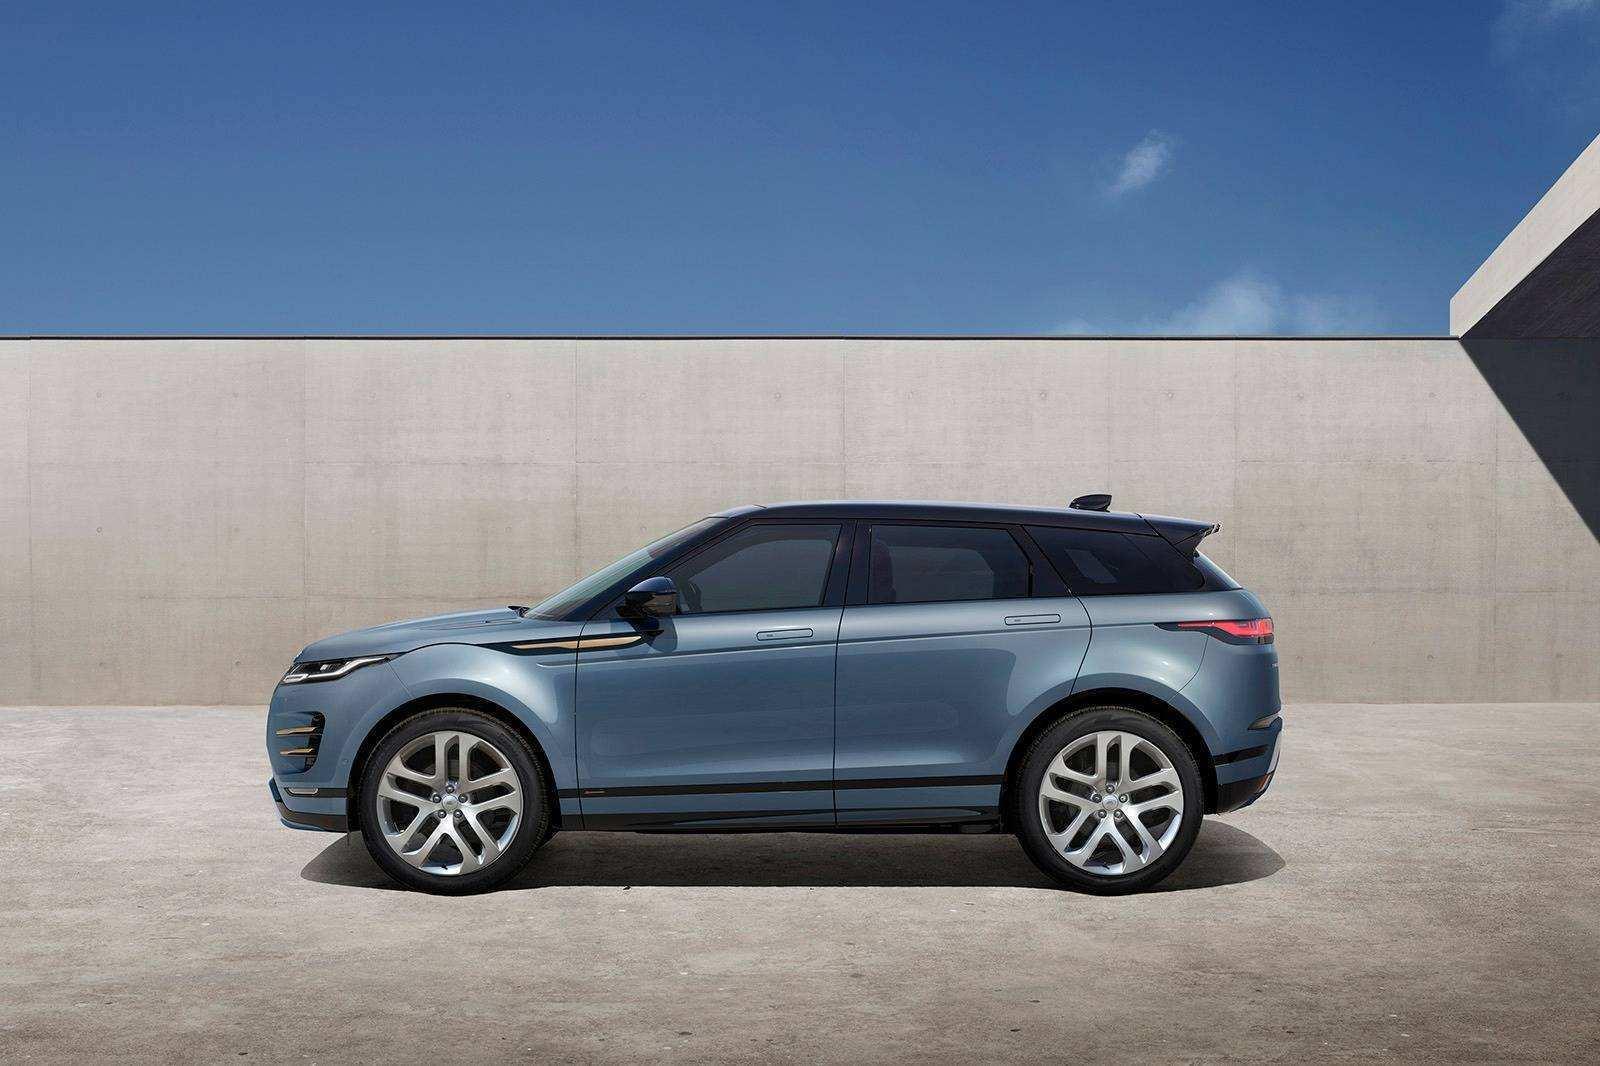 11 All New Jaguar Land Rover 2020 Vision Spy Shoot with Jaguar Land Rover 2020 Vision